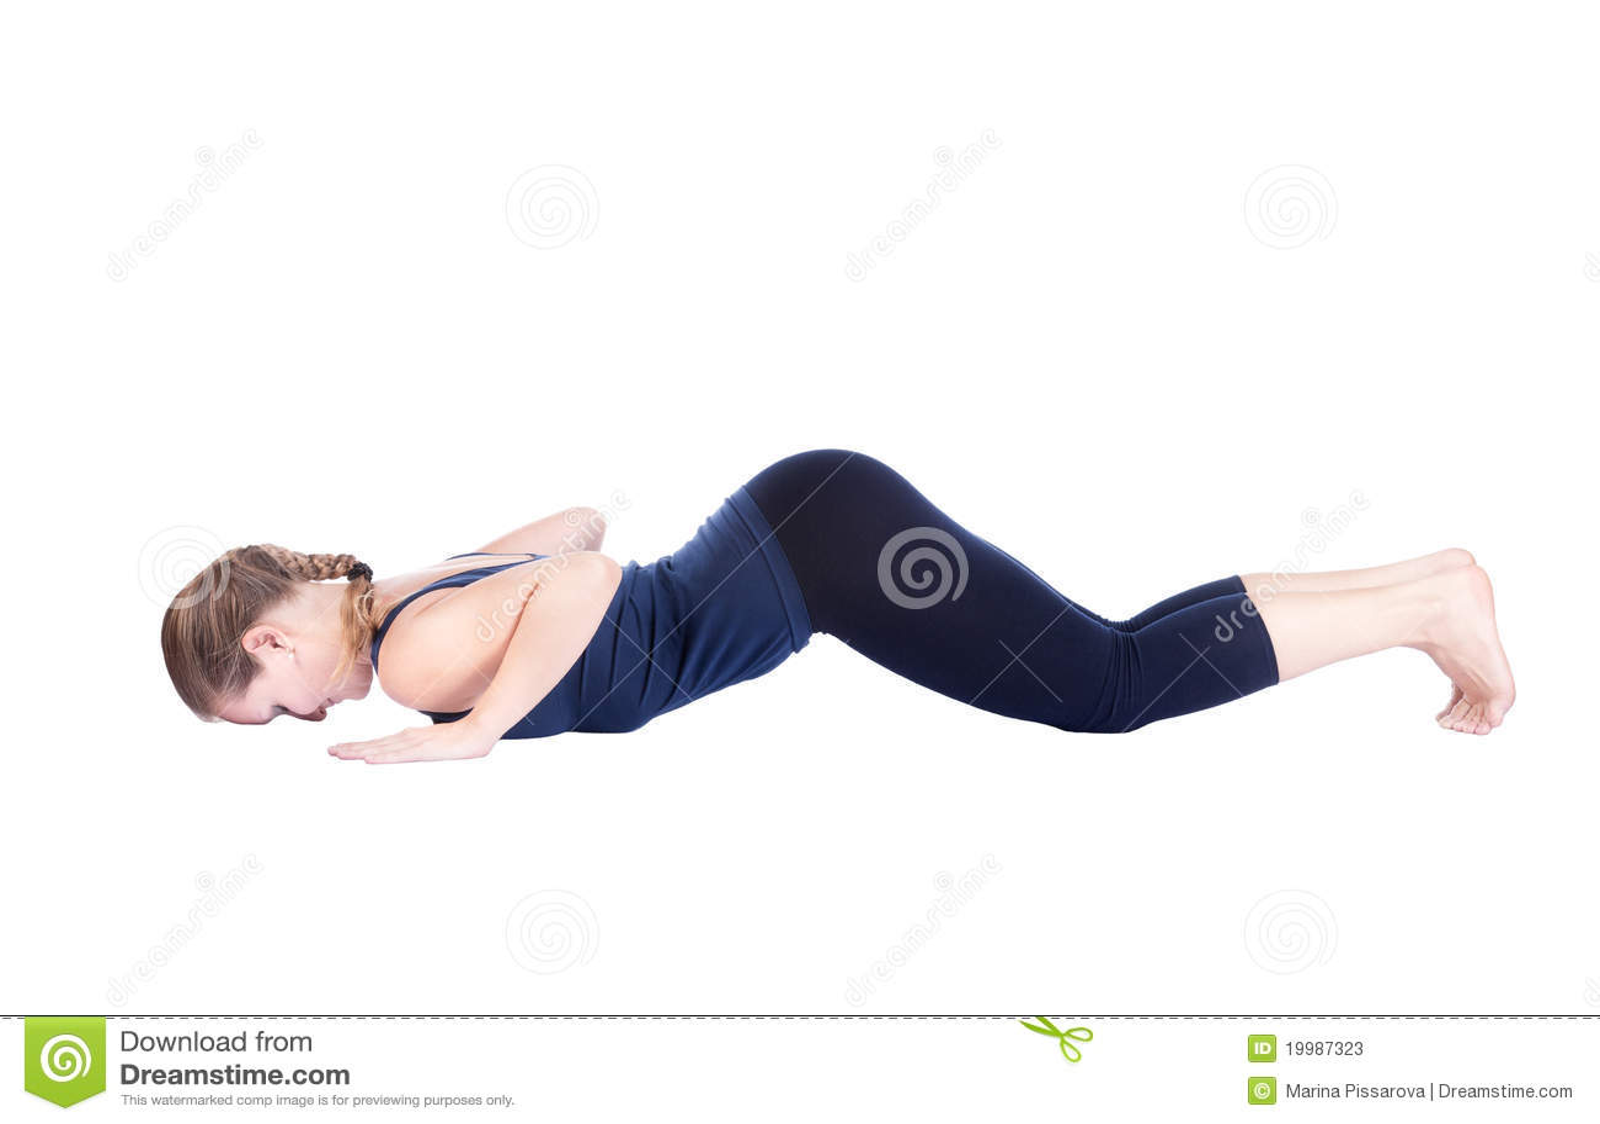 yoga business plan pdf